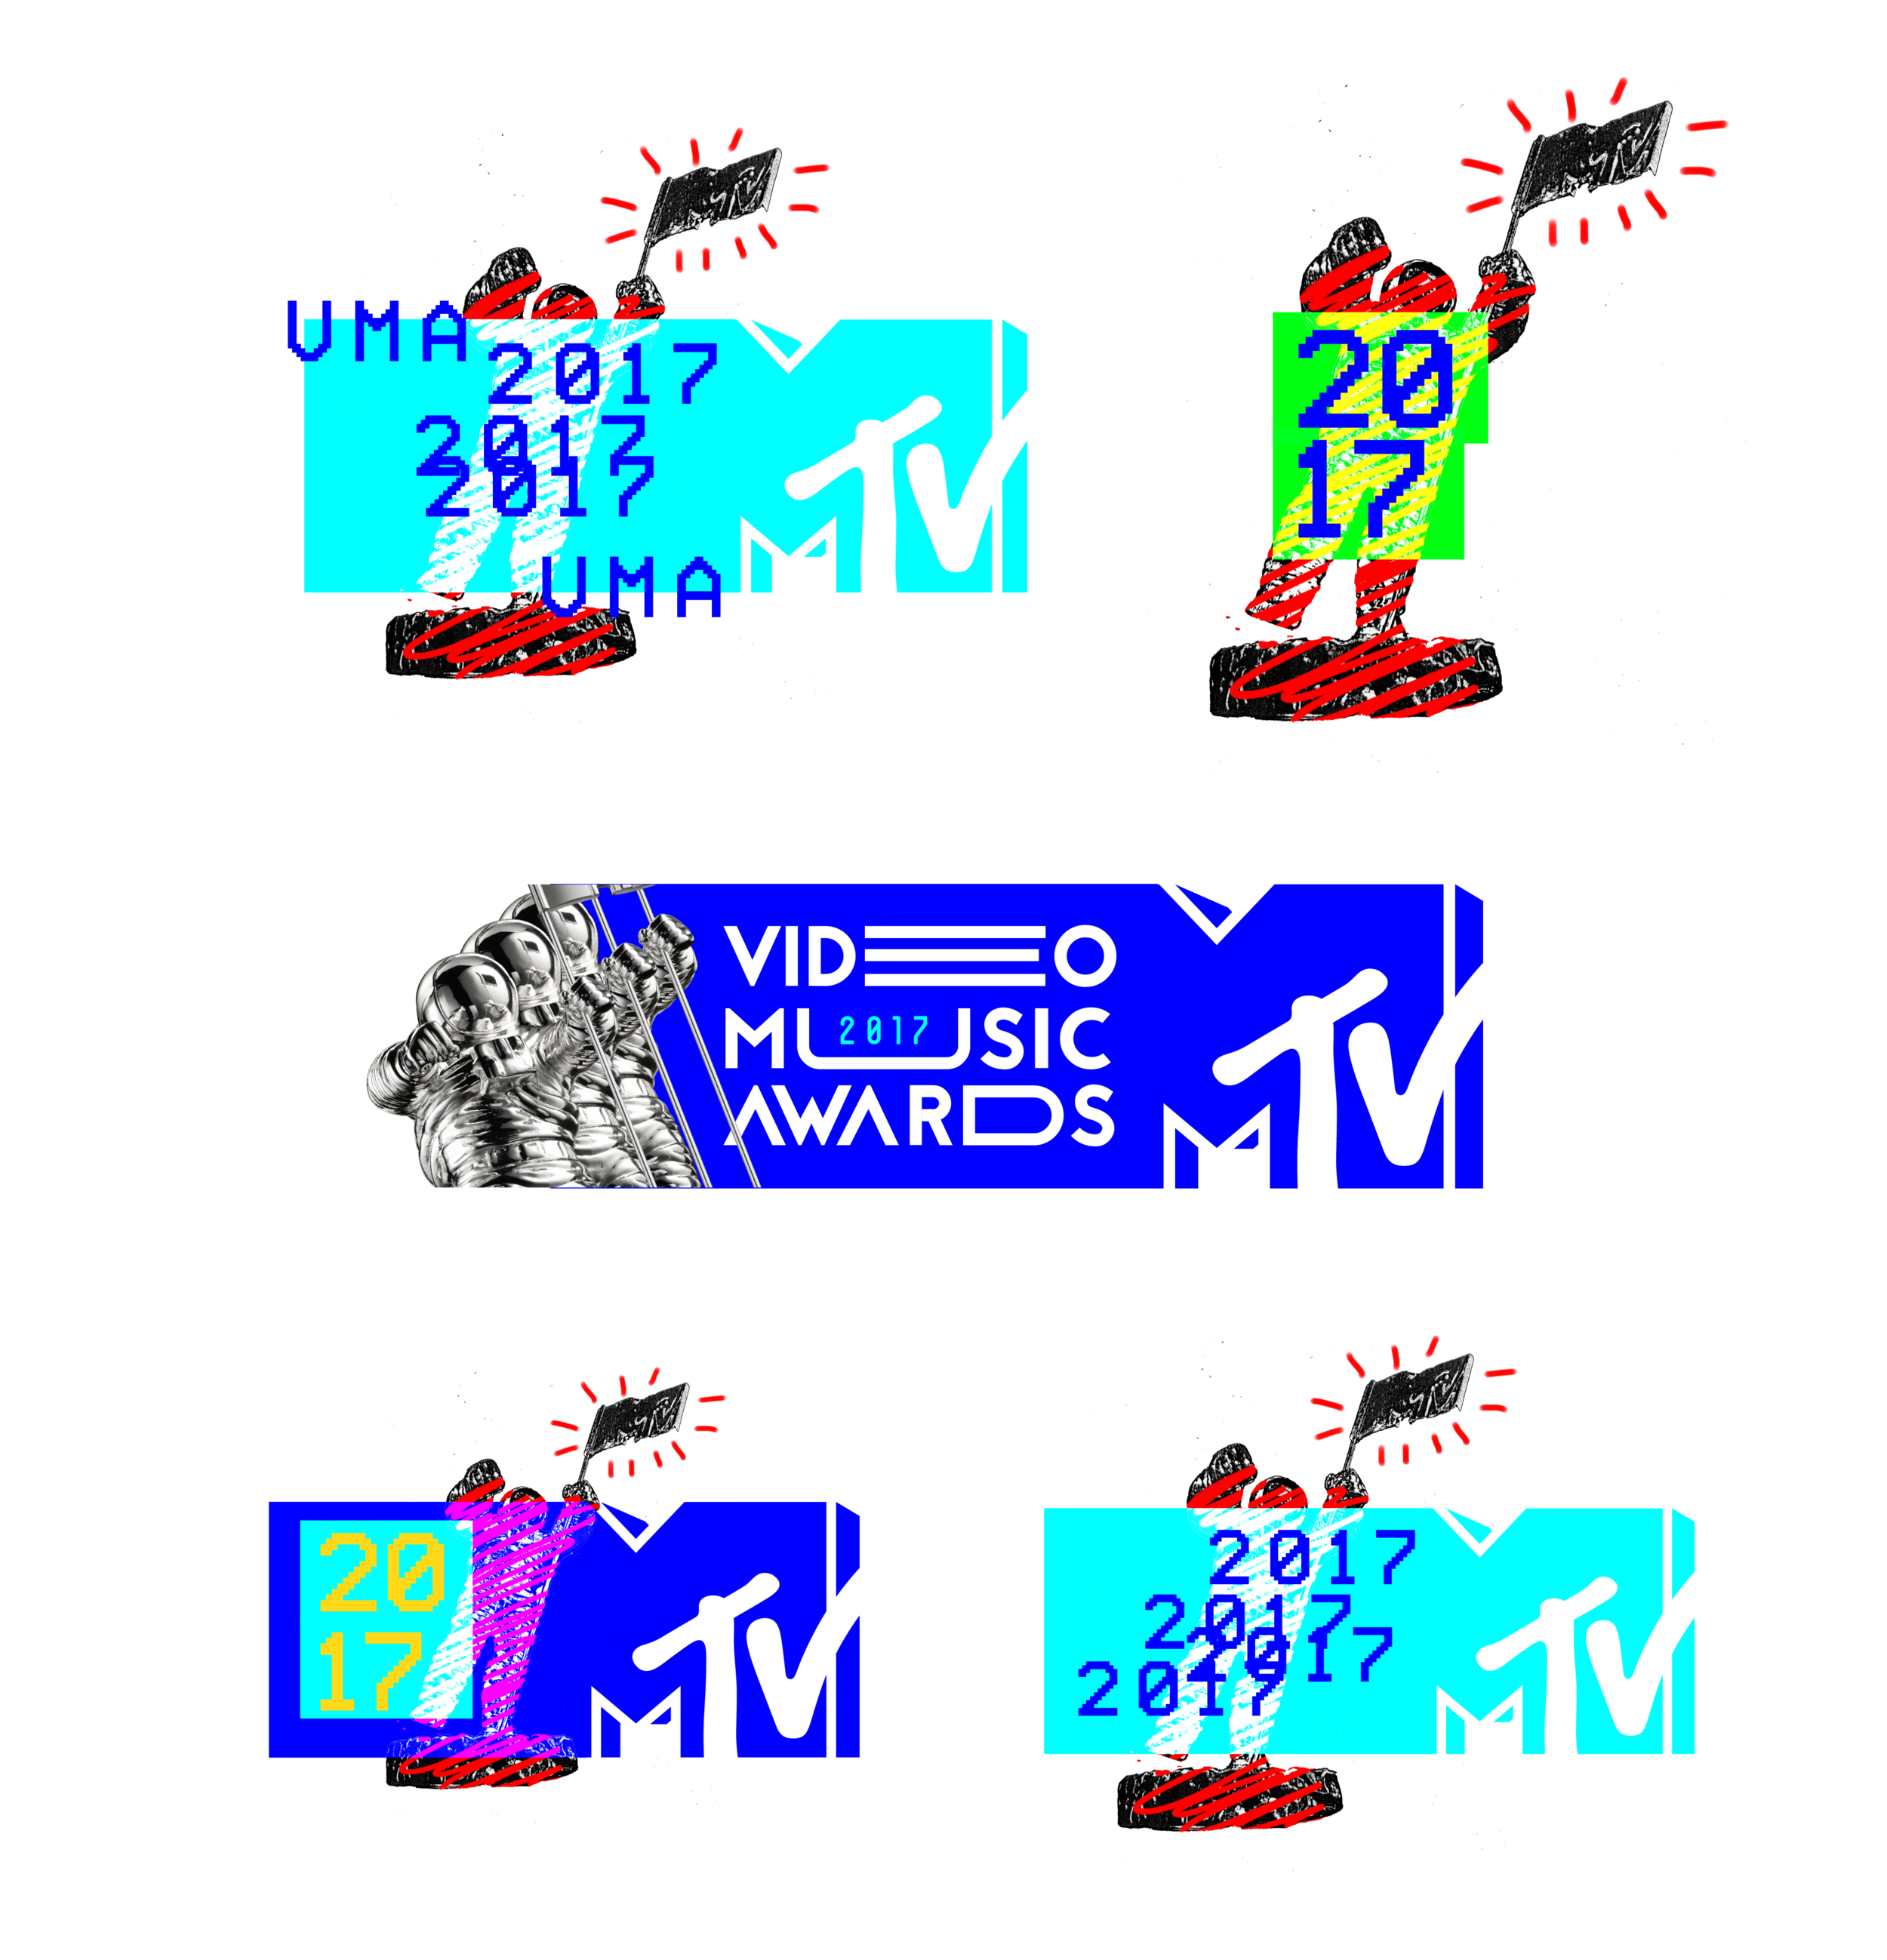 VMA_R2-11.png